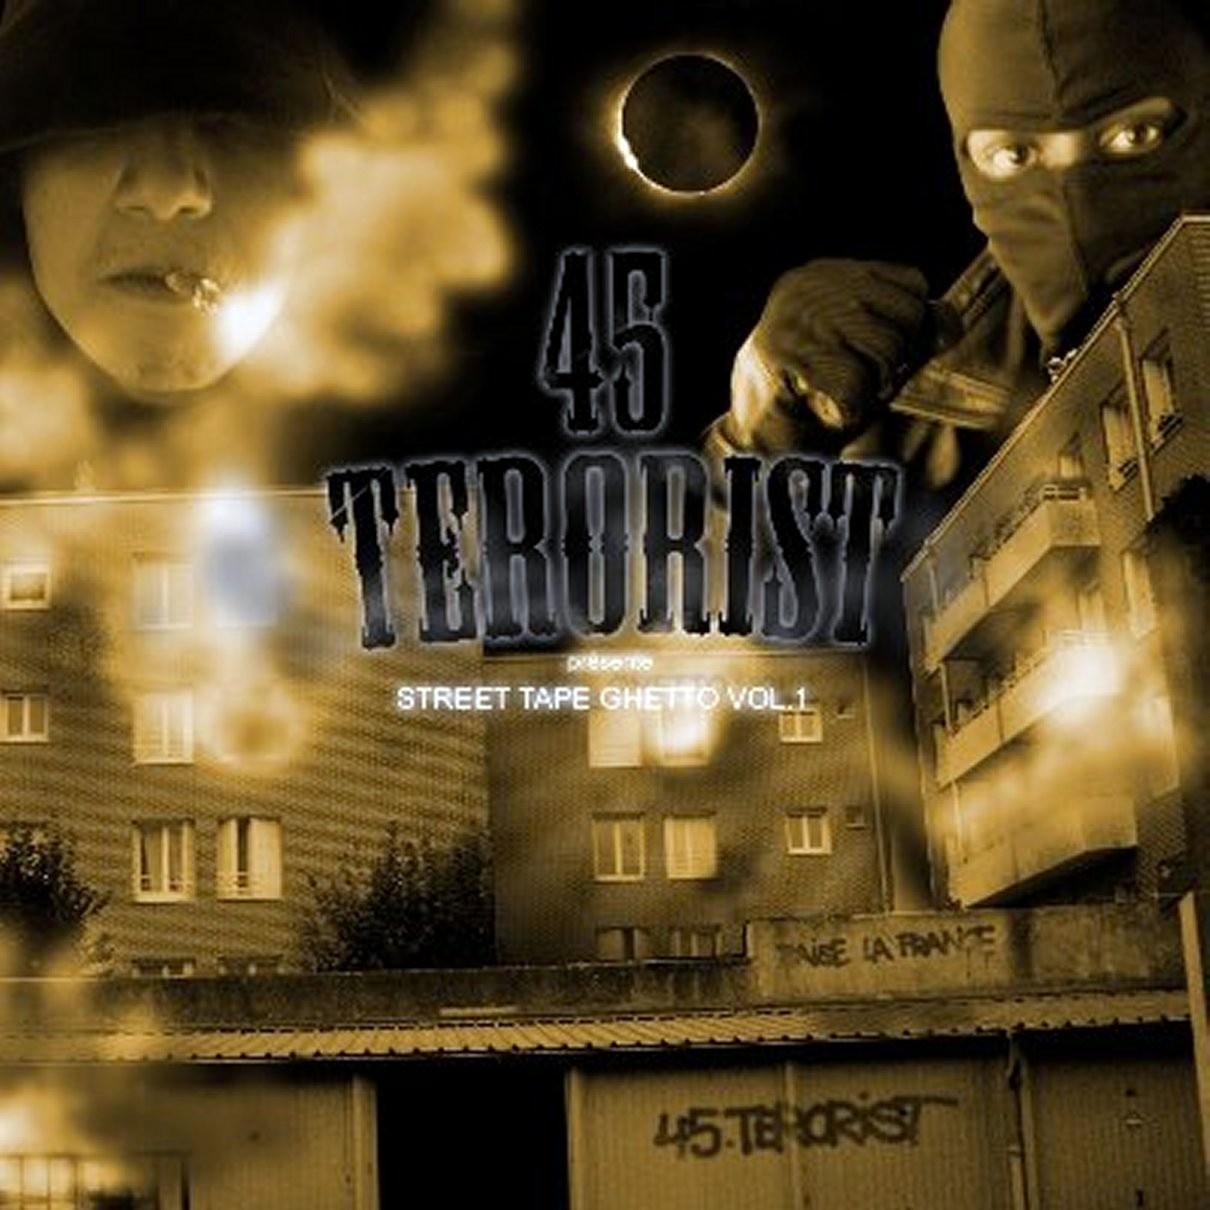 TERO RHO STREET TERORIST BOMBE 45 TÉLÉCHARGER